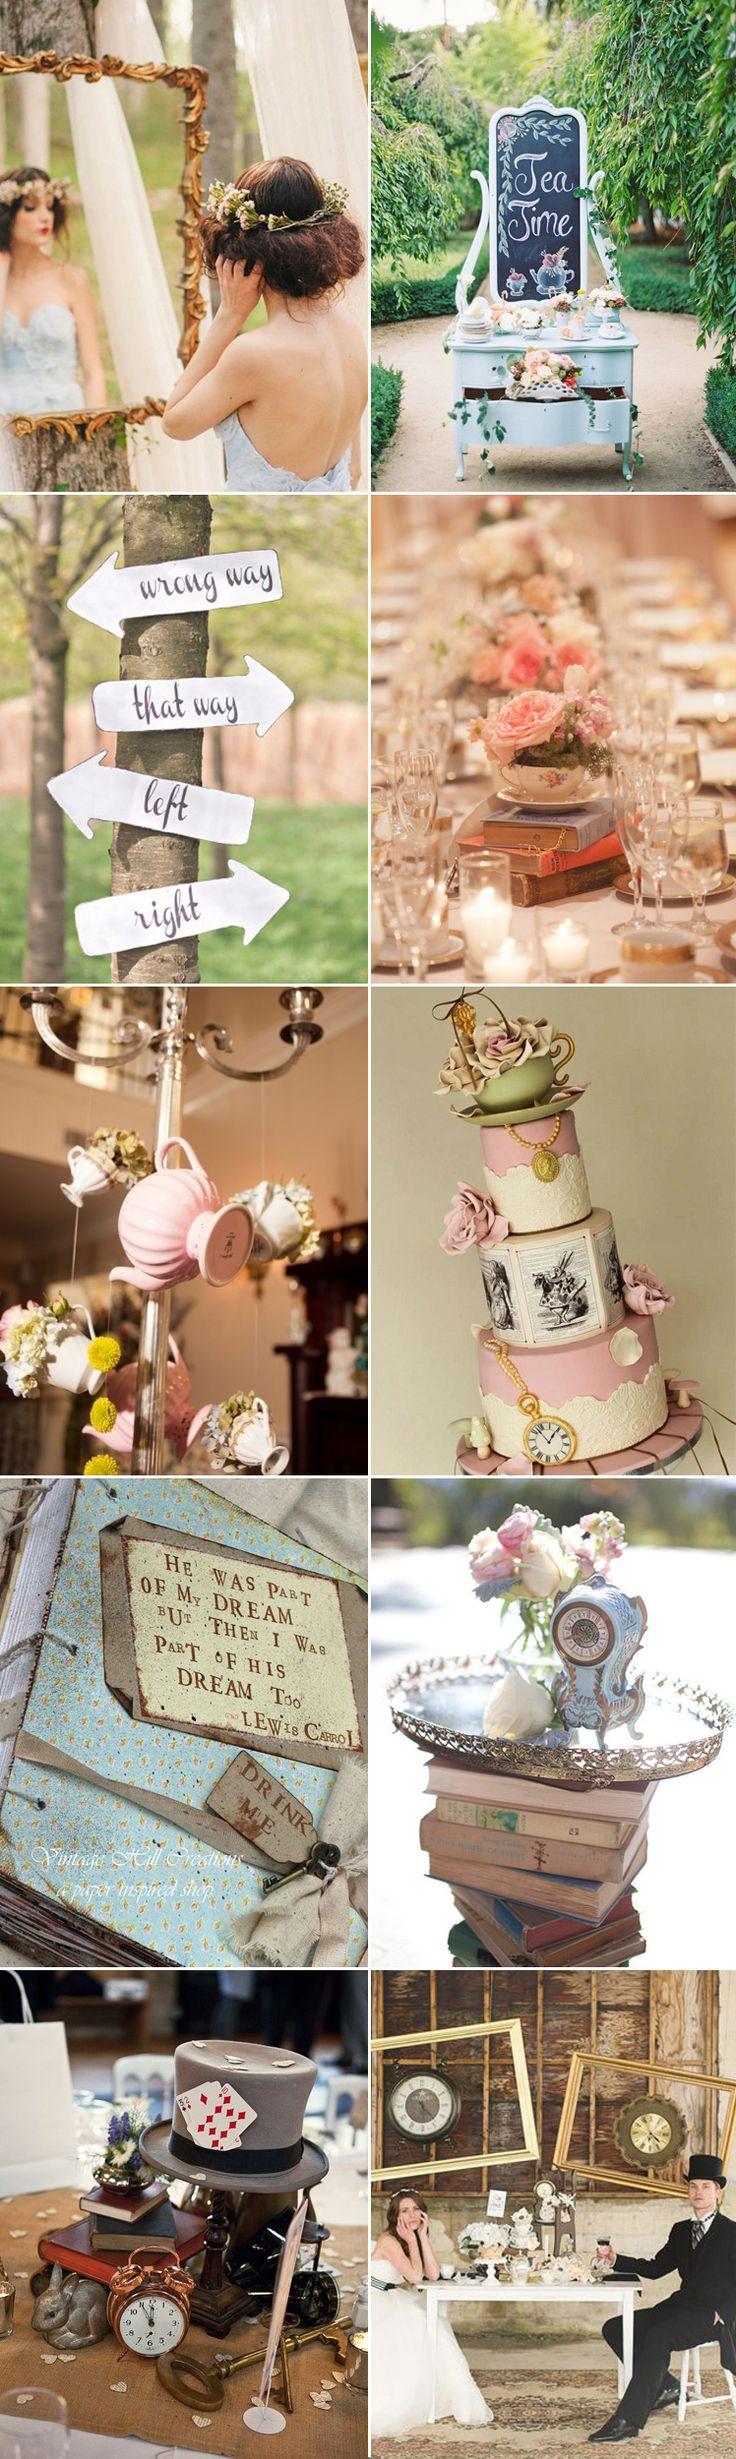 Alice in Wonderland: A Bookish Wedding   Beautiful wedding ideas on GS Inspiration